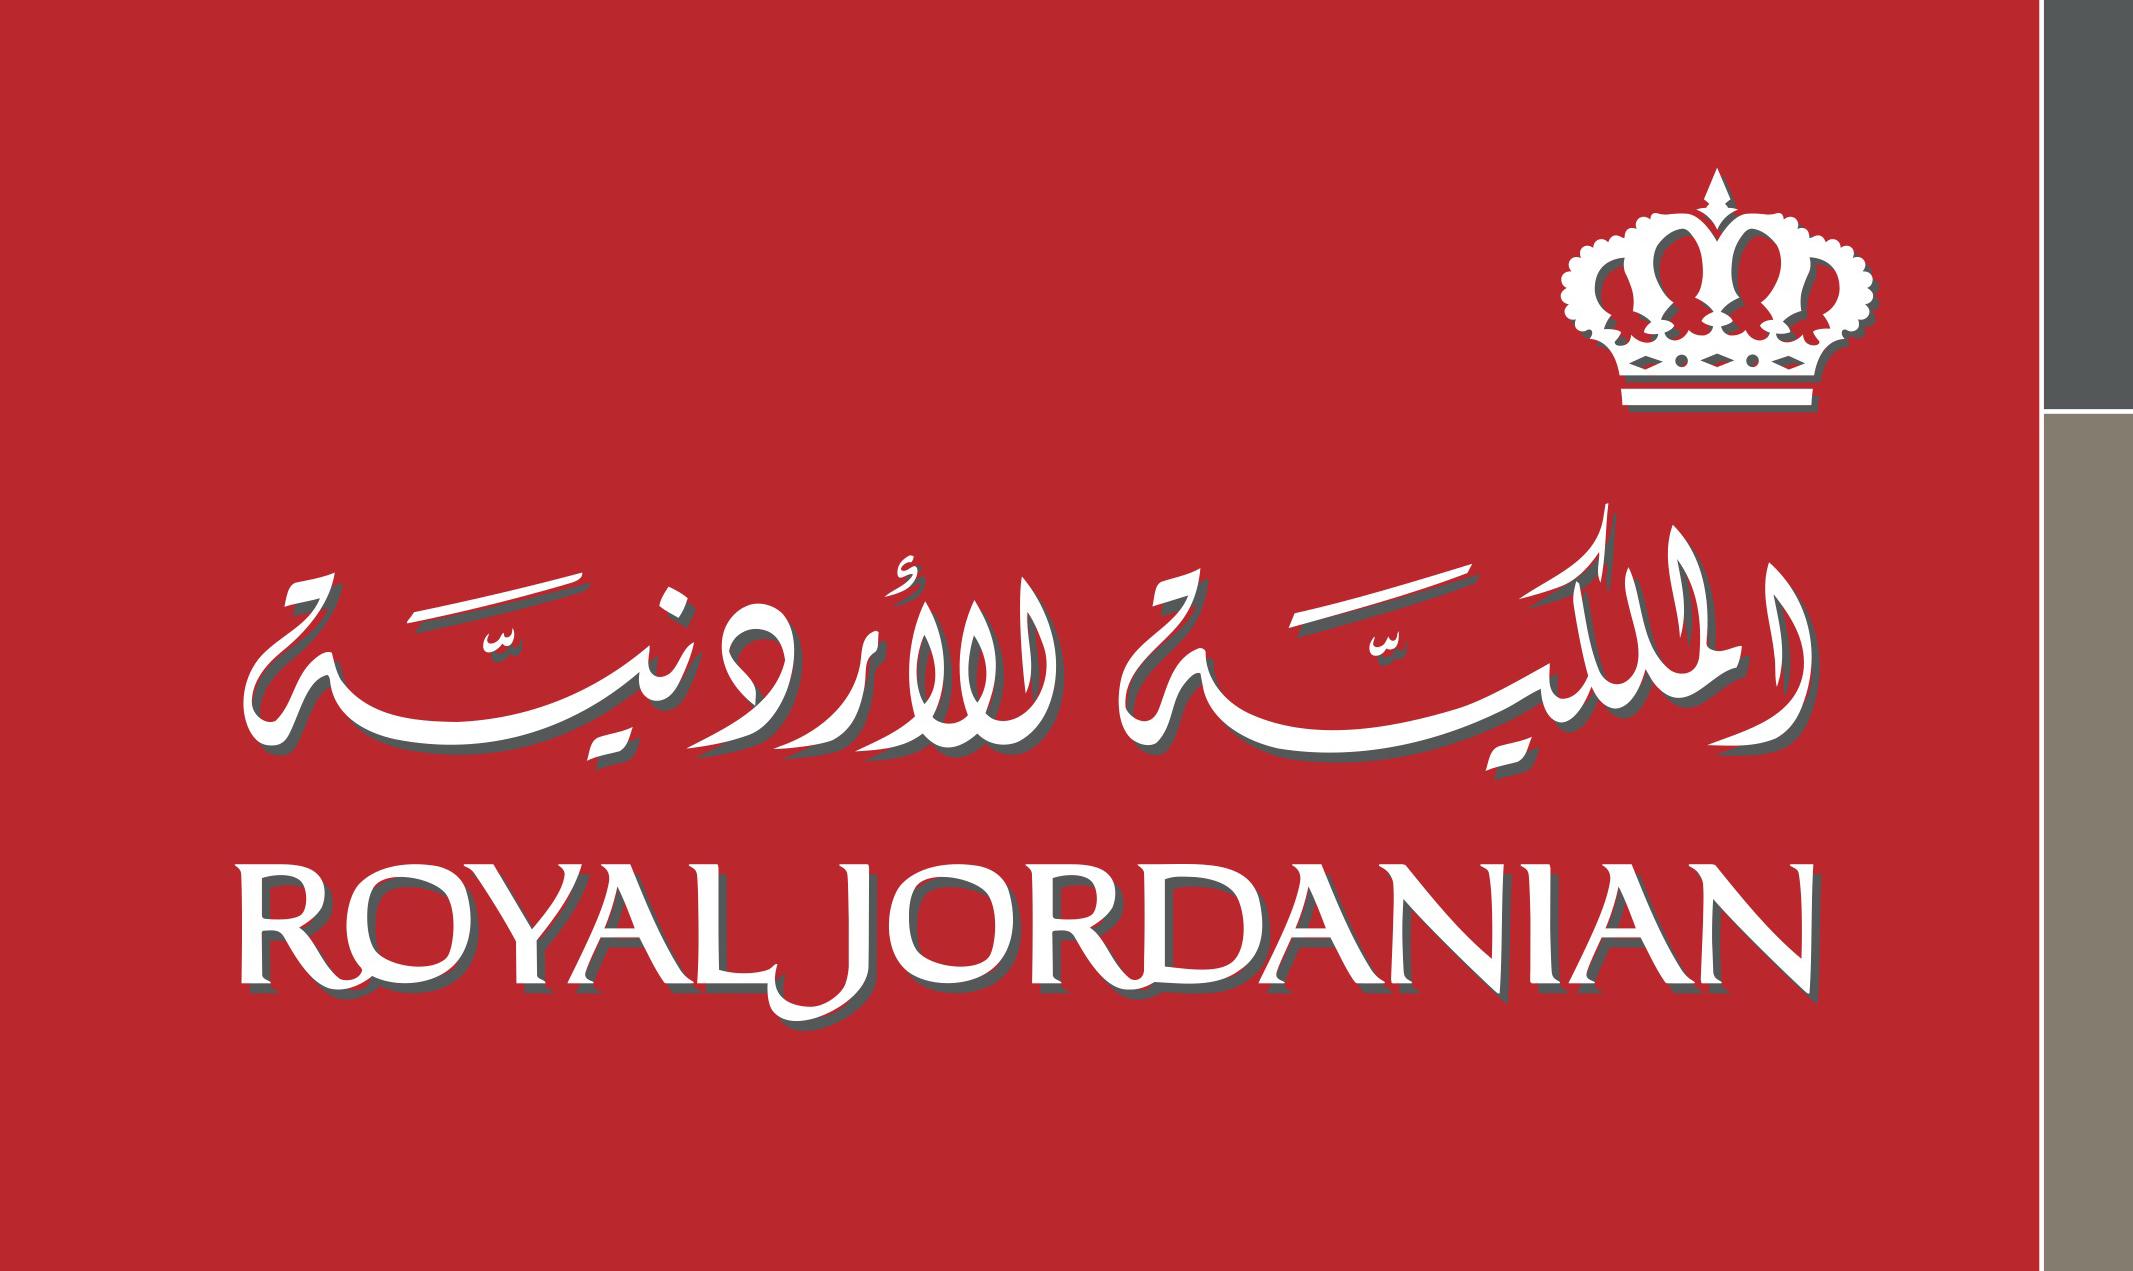 RJ_logo_sponsorship_OC copy.jpg